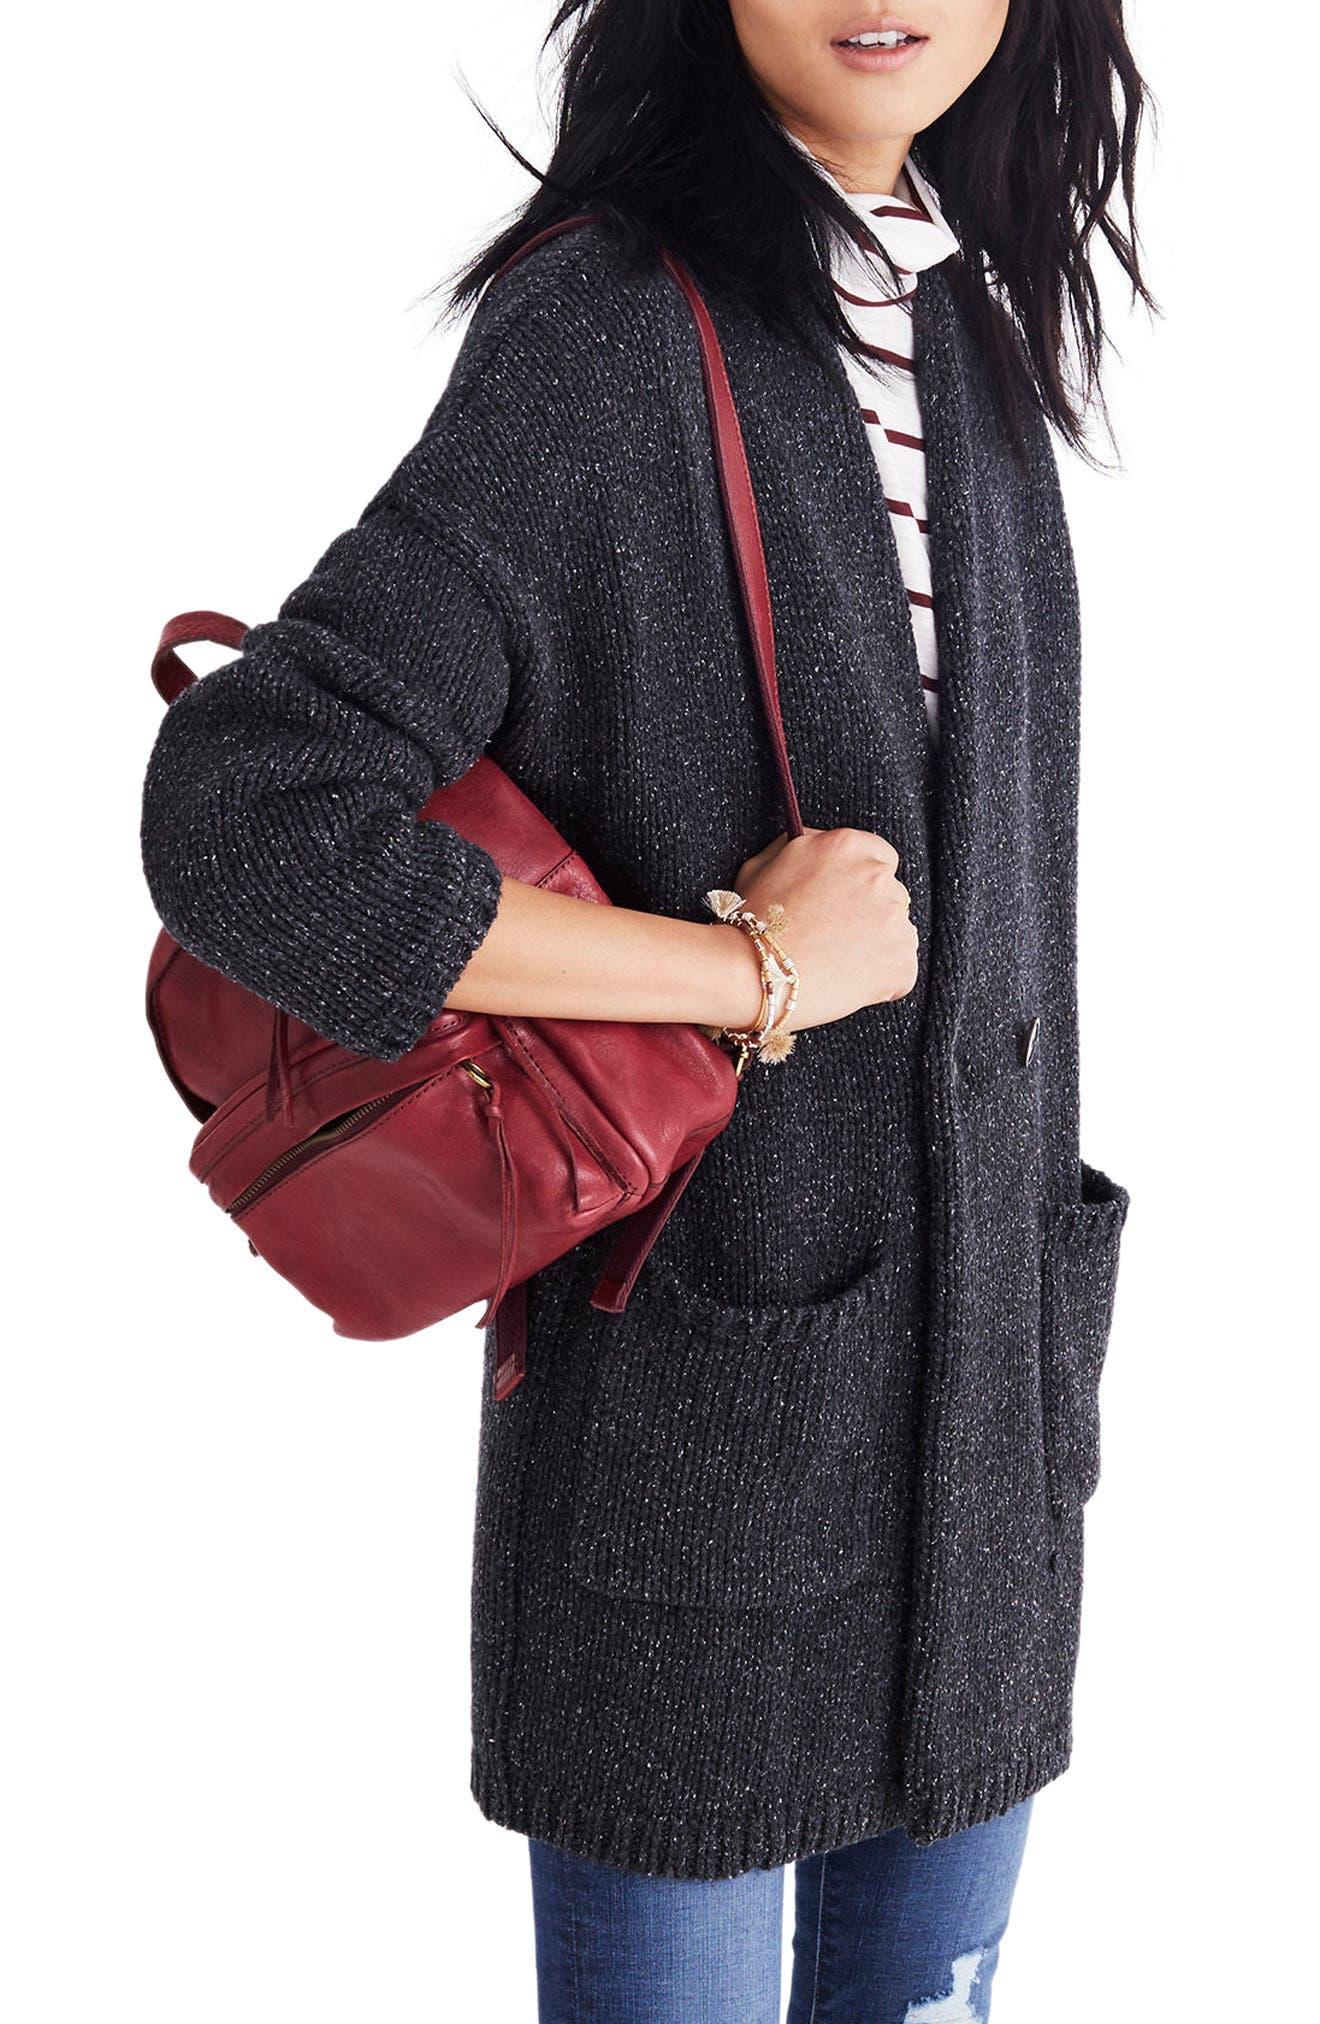 Glenhill Sweater Coat,                         Main,                         color, Ashland Slate